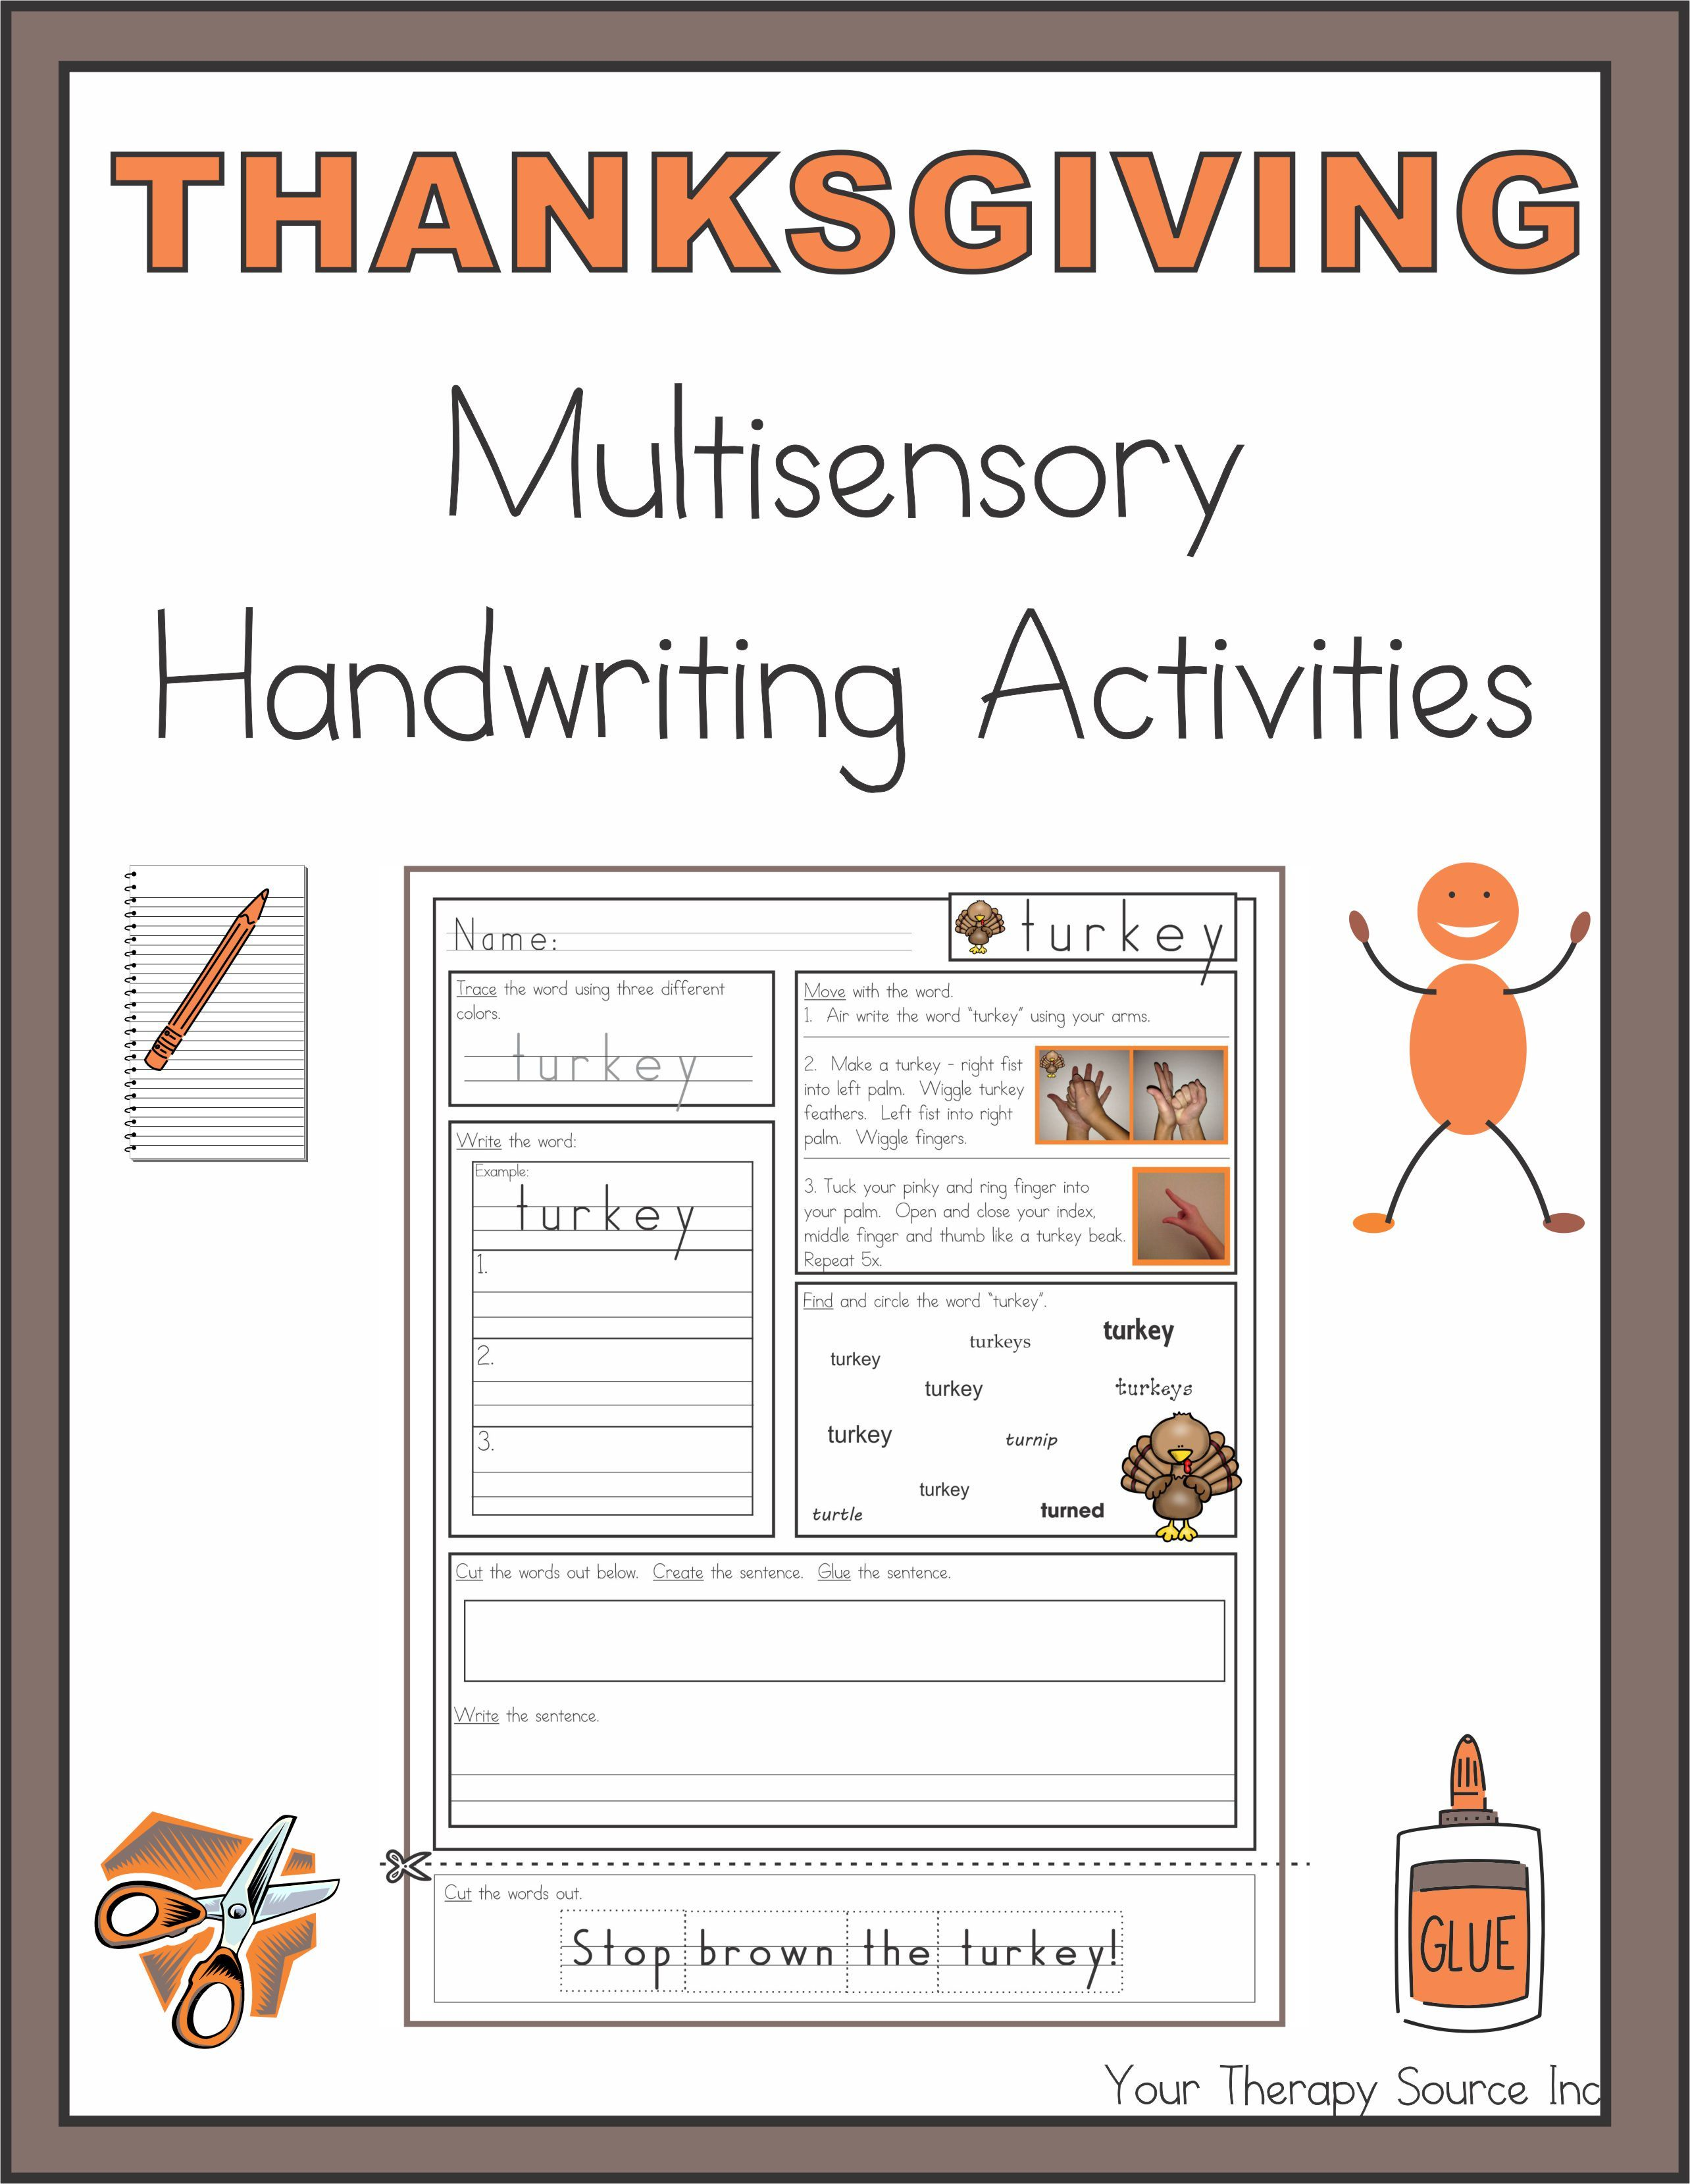 Thanksgiving Multisensory Handwriting Activities